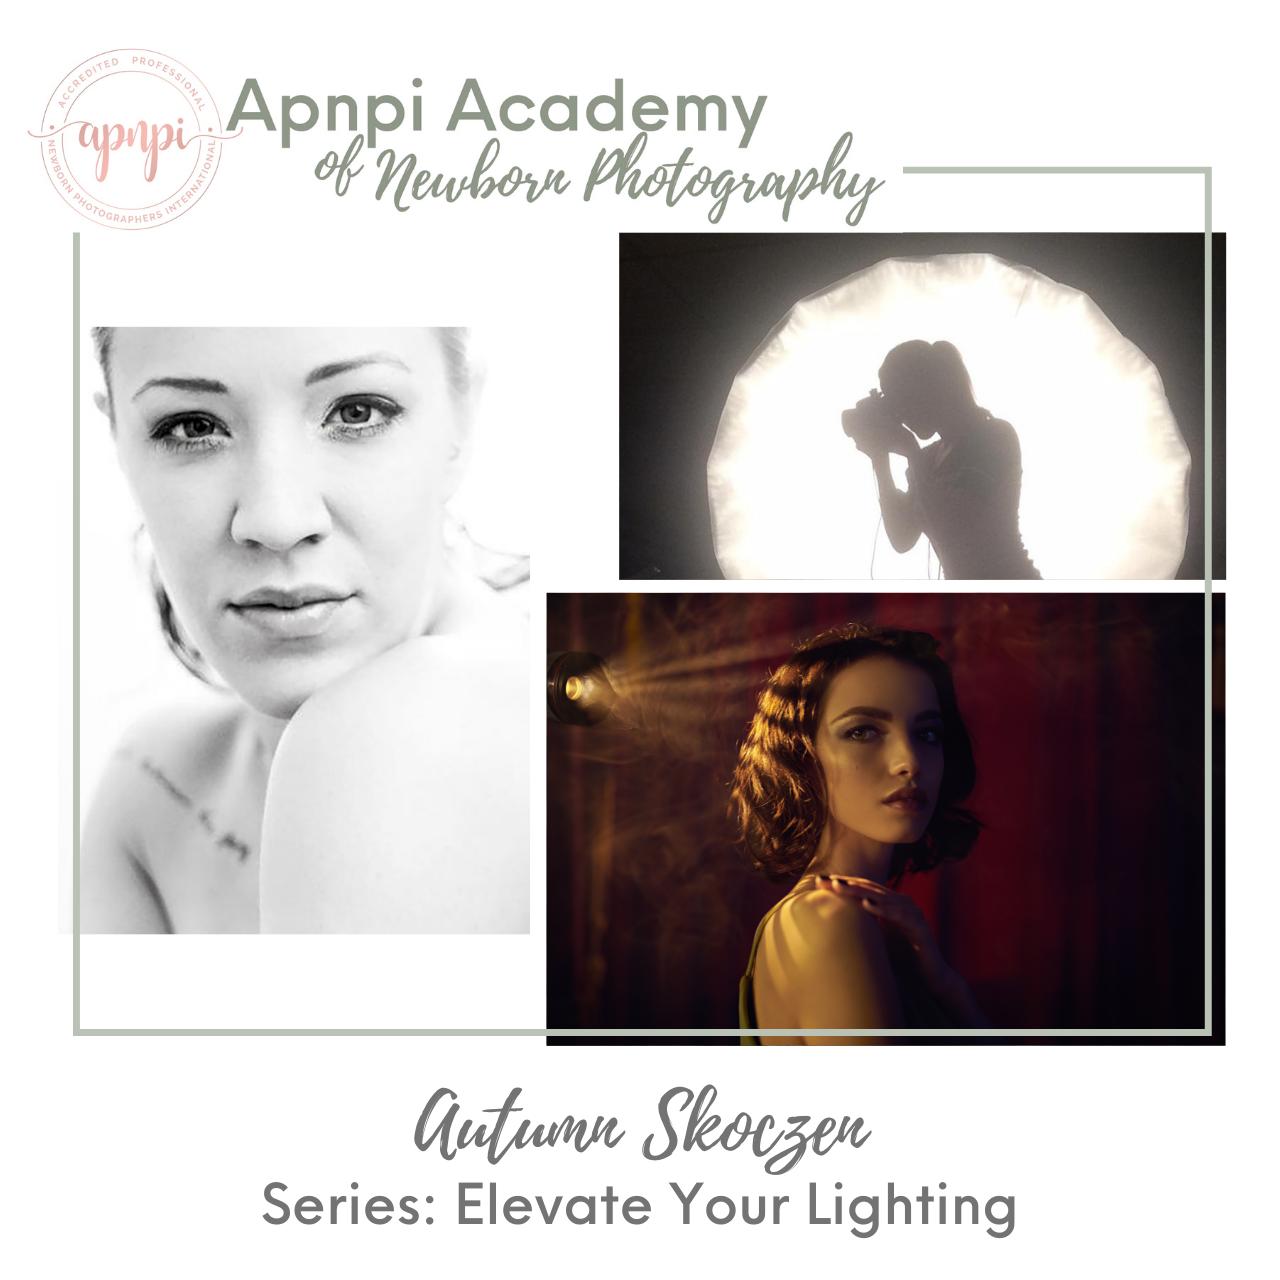 Autumn Skoczen Newborn Lighting APNPI Academy Course